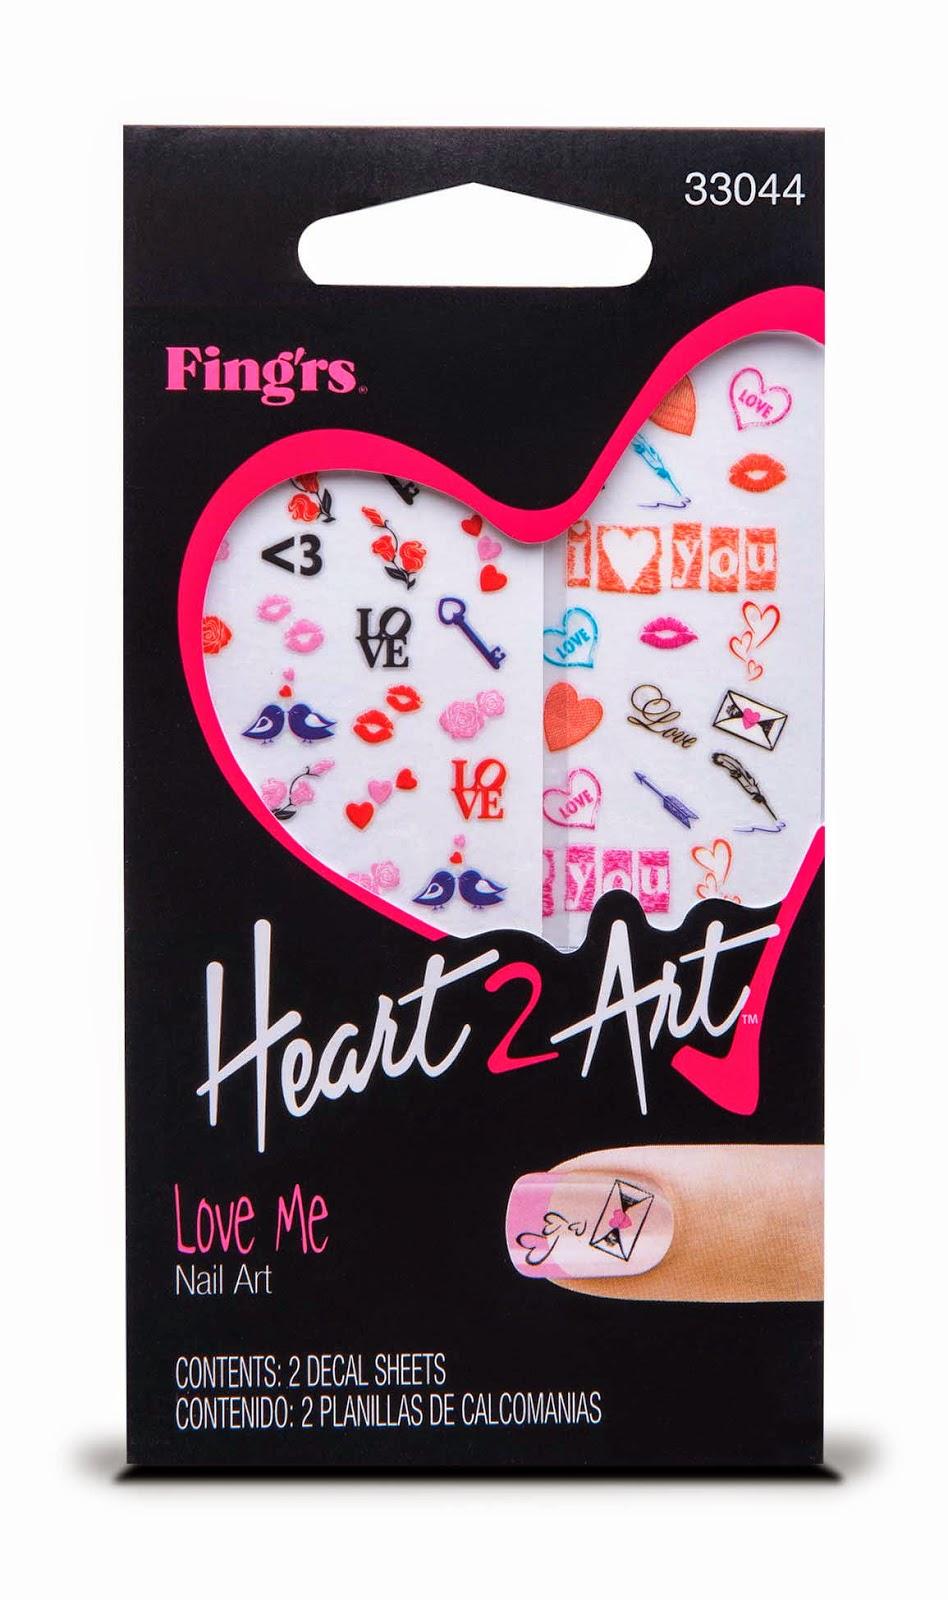 Heart2Art - Love Me